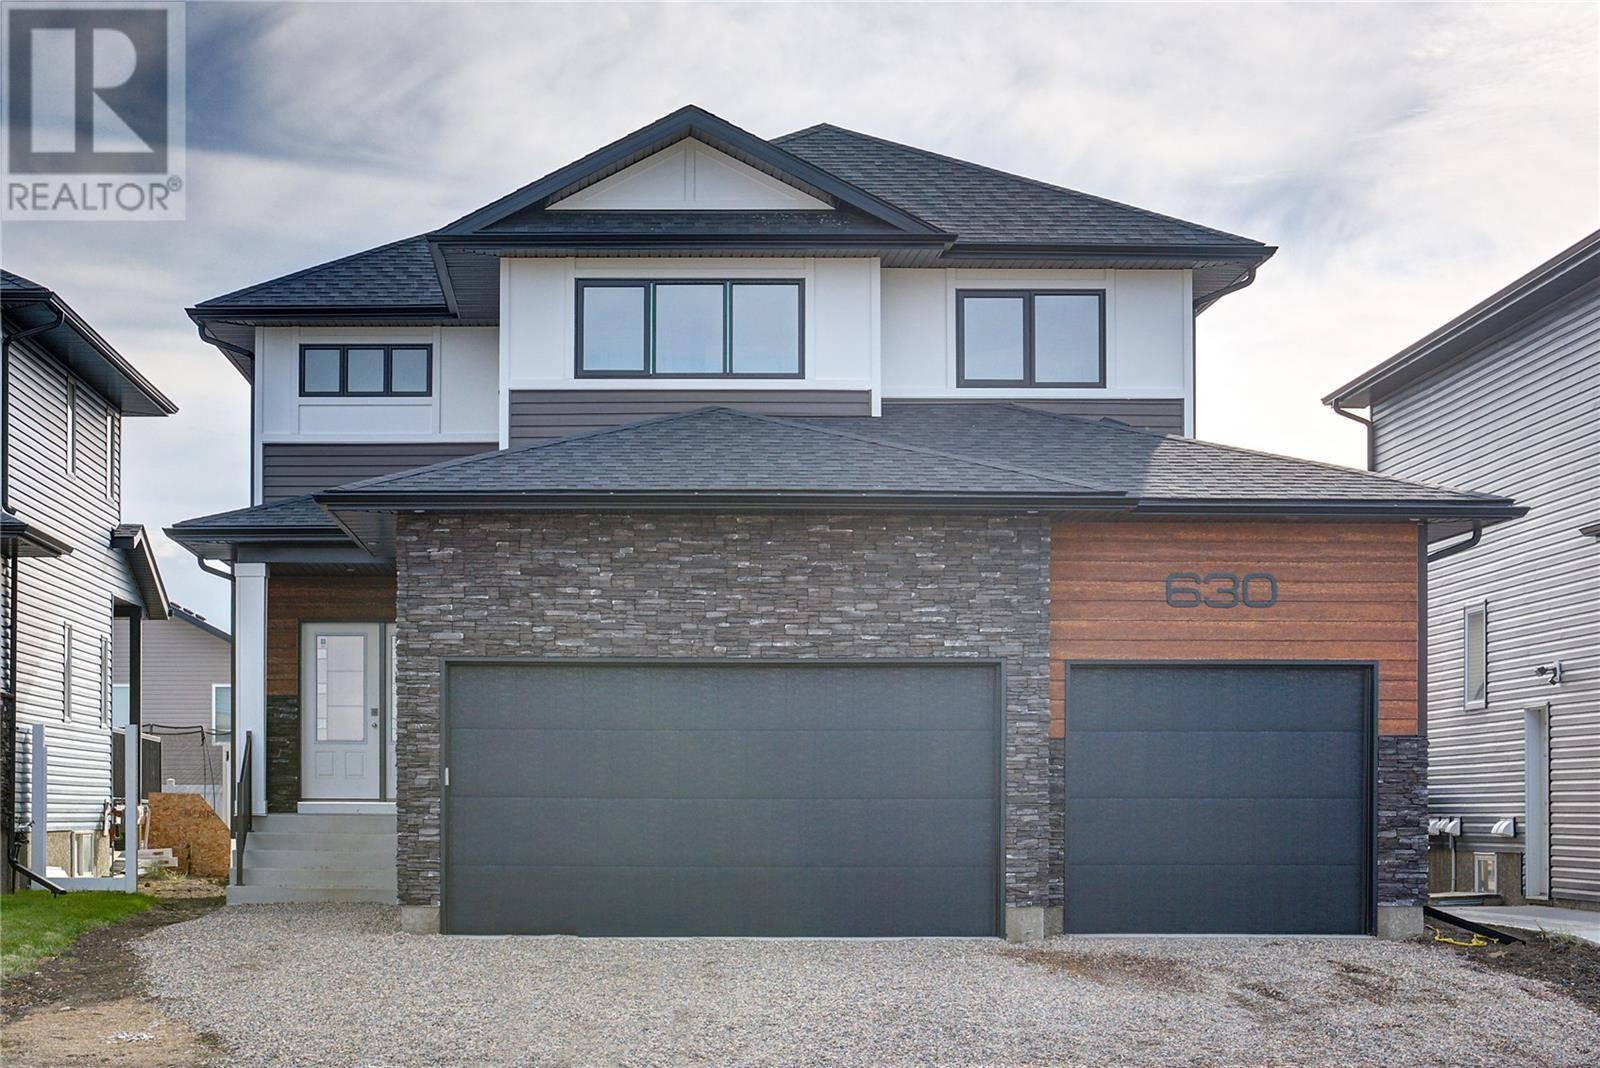 House for sale at 630 Boykowich Cres Saskatoon Saskatchewan - MLS: SK789454